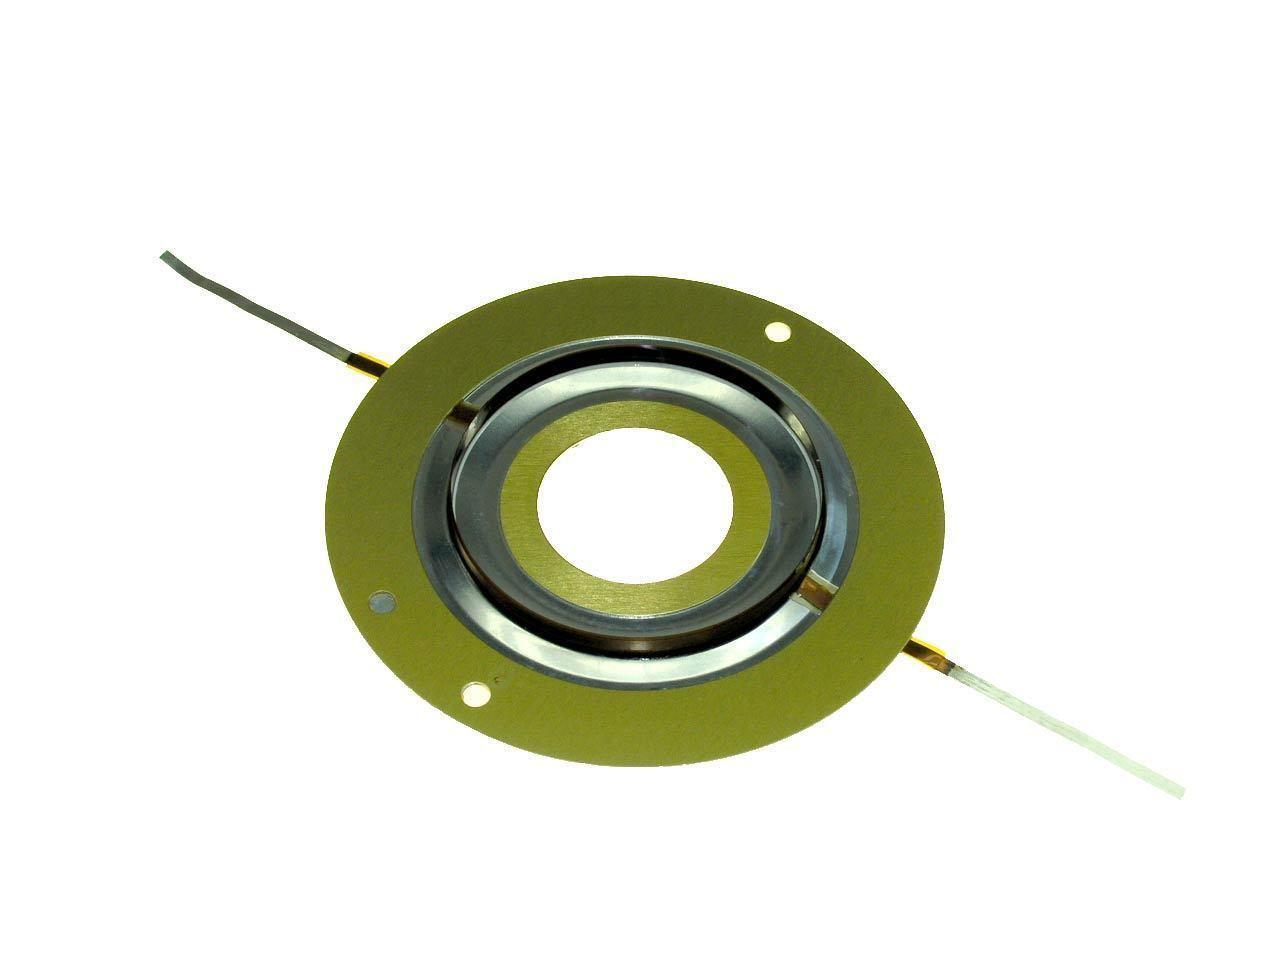 SS Audio Diafragma para JBL 2404H 2404H 2404H controlador de cuerno, D-2404 5f8eda